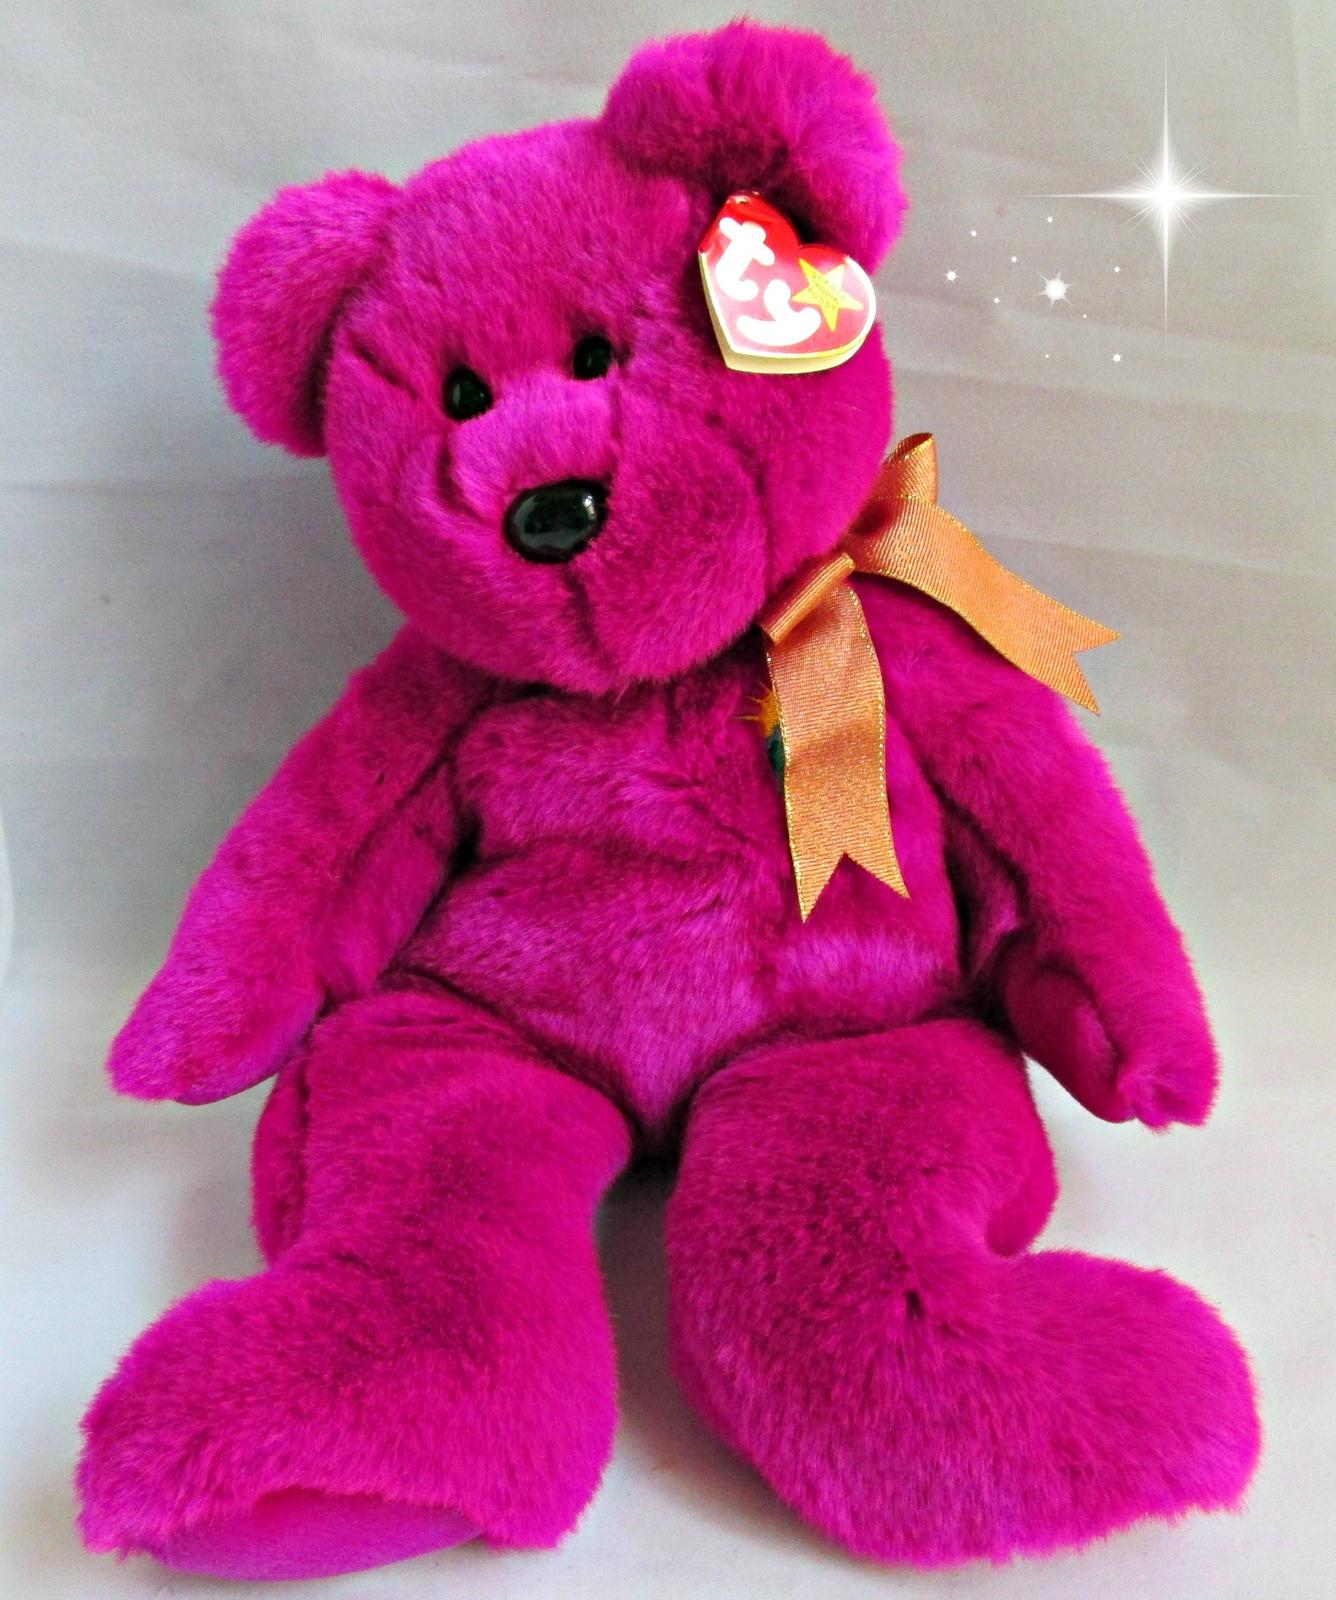 Beanie Baby Millennium Beanie Buddy TY Inc and 50 similar items.  Beanie2000.10 7e4b8fbd6132